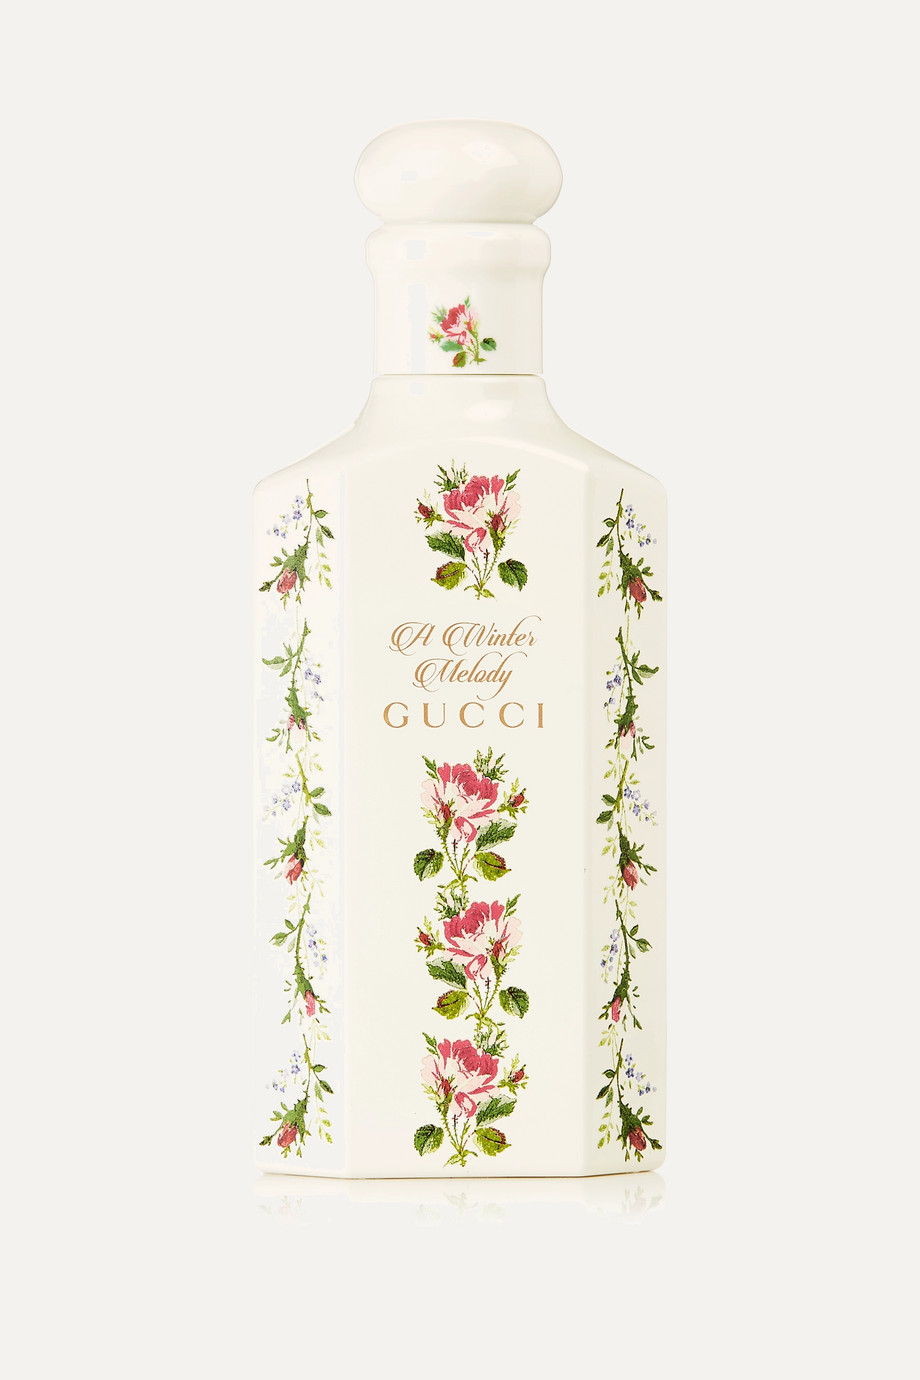 Gucci Beauty Gucci: The Alchemist's Garden – A Winter Melody, 150 ml – Eau de Toilette